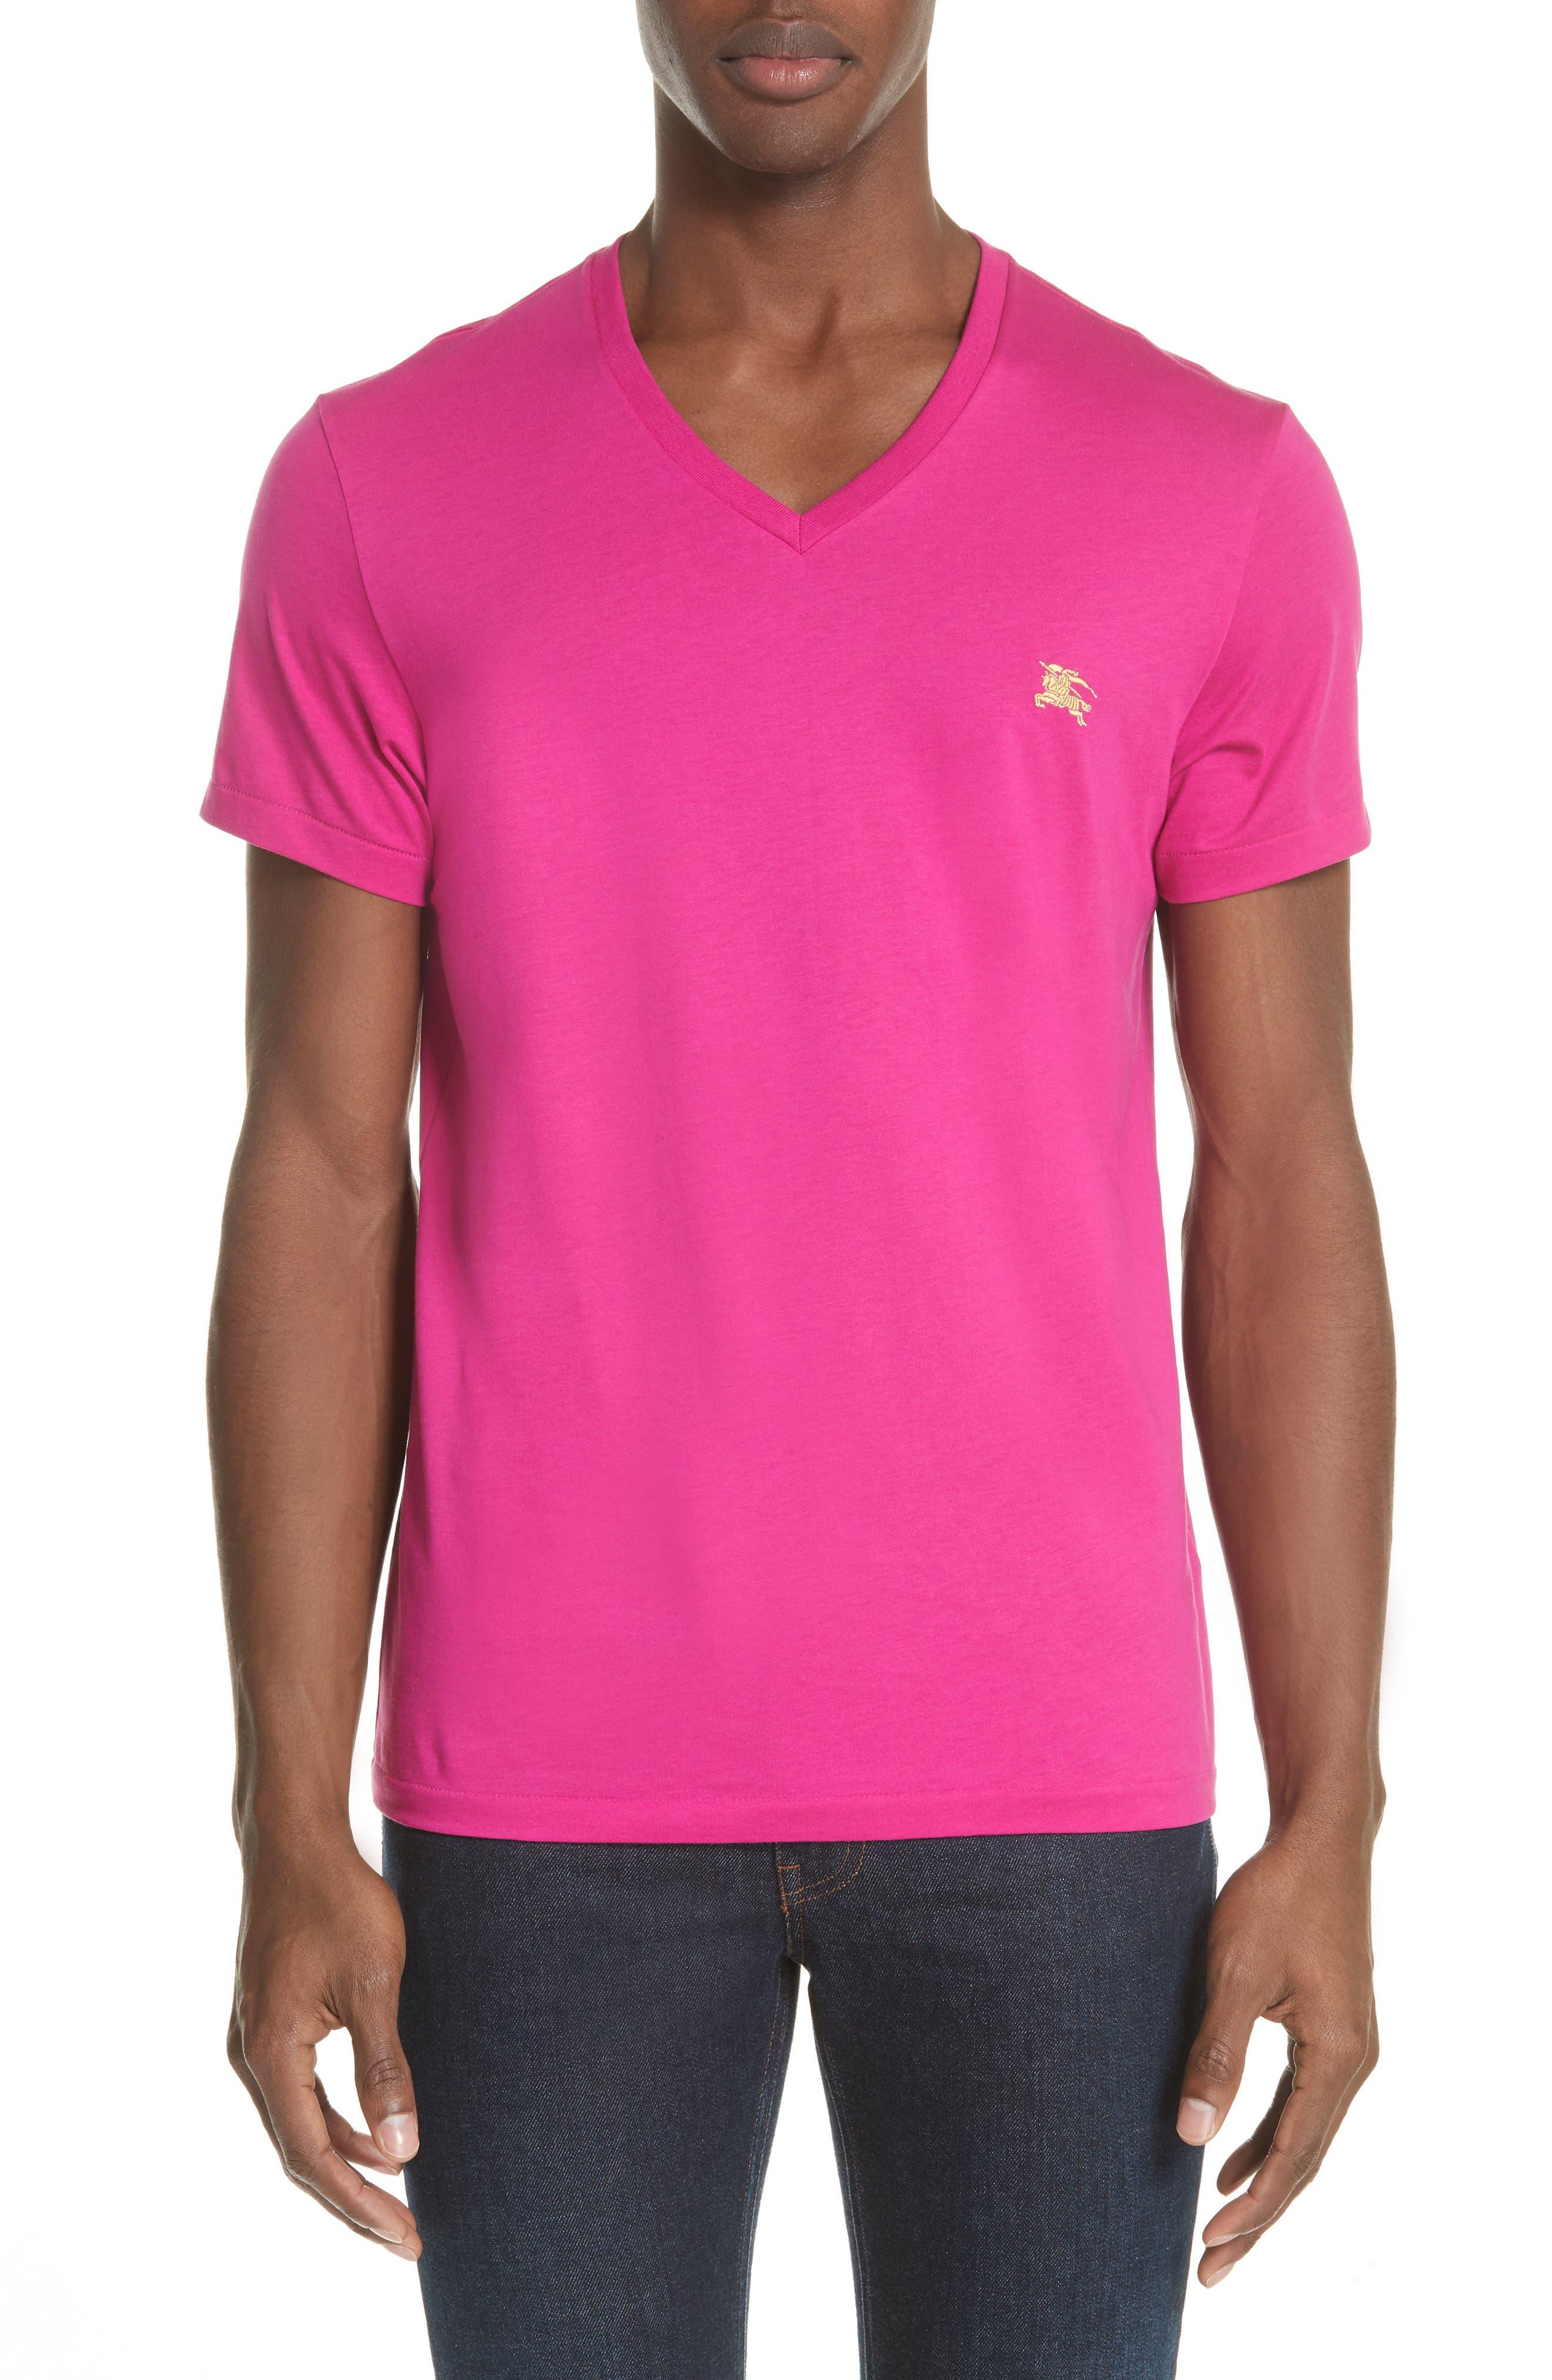 Burberry Jadford V-Neck T-Shirt